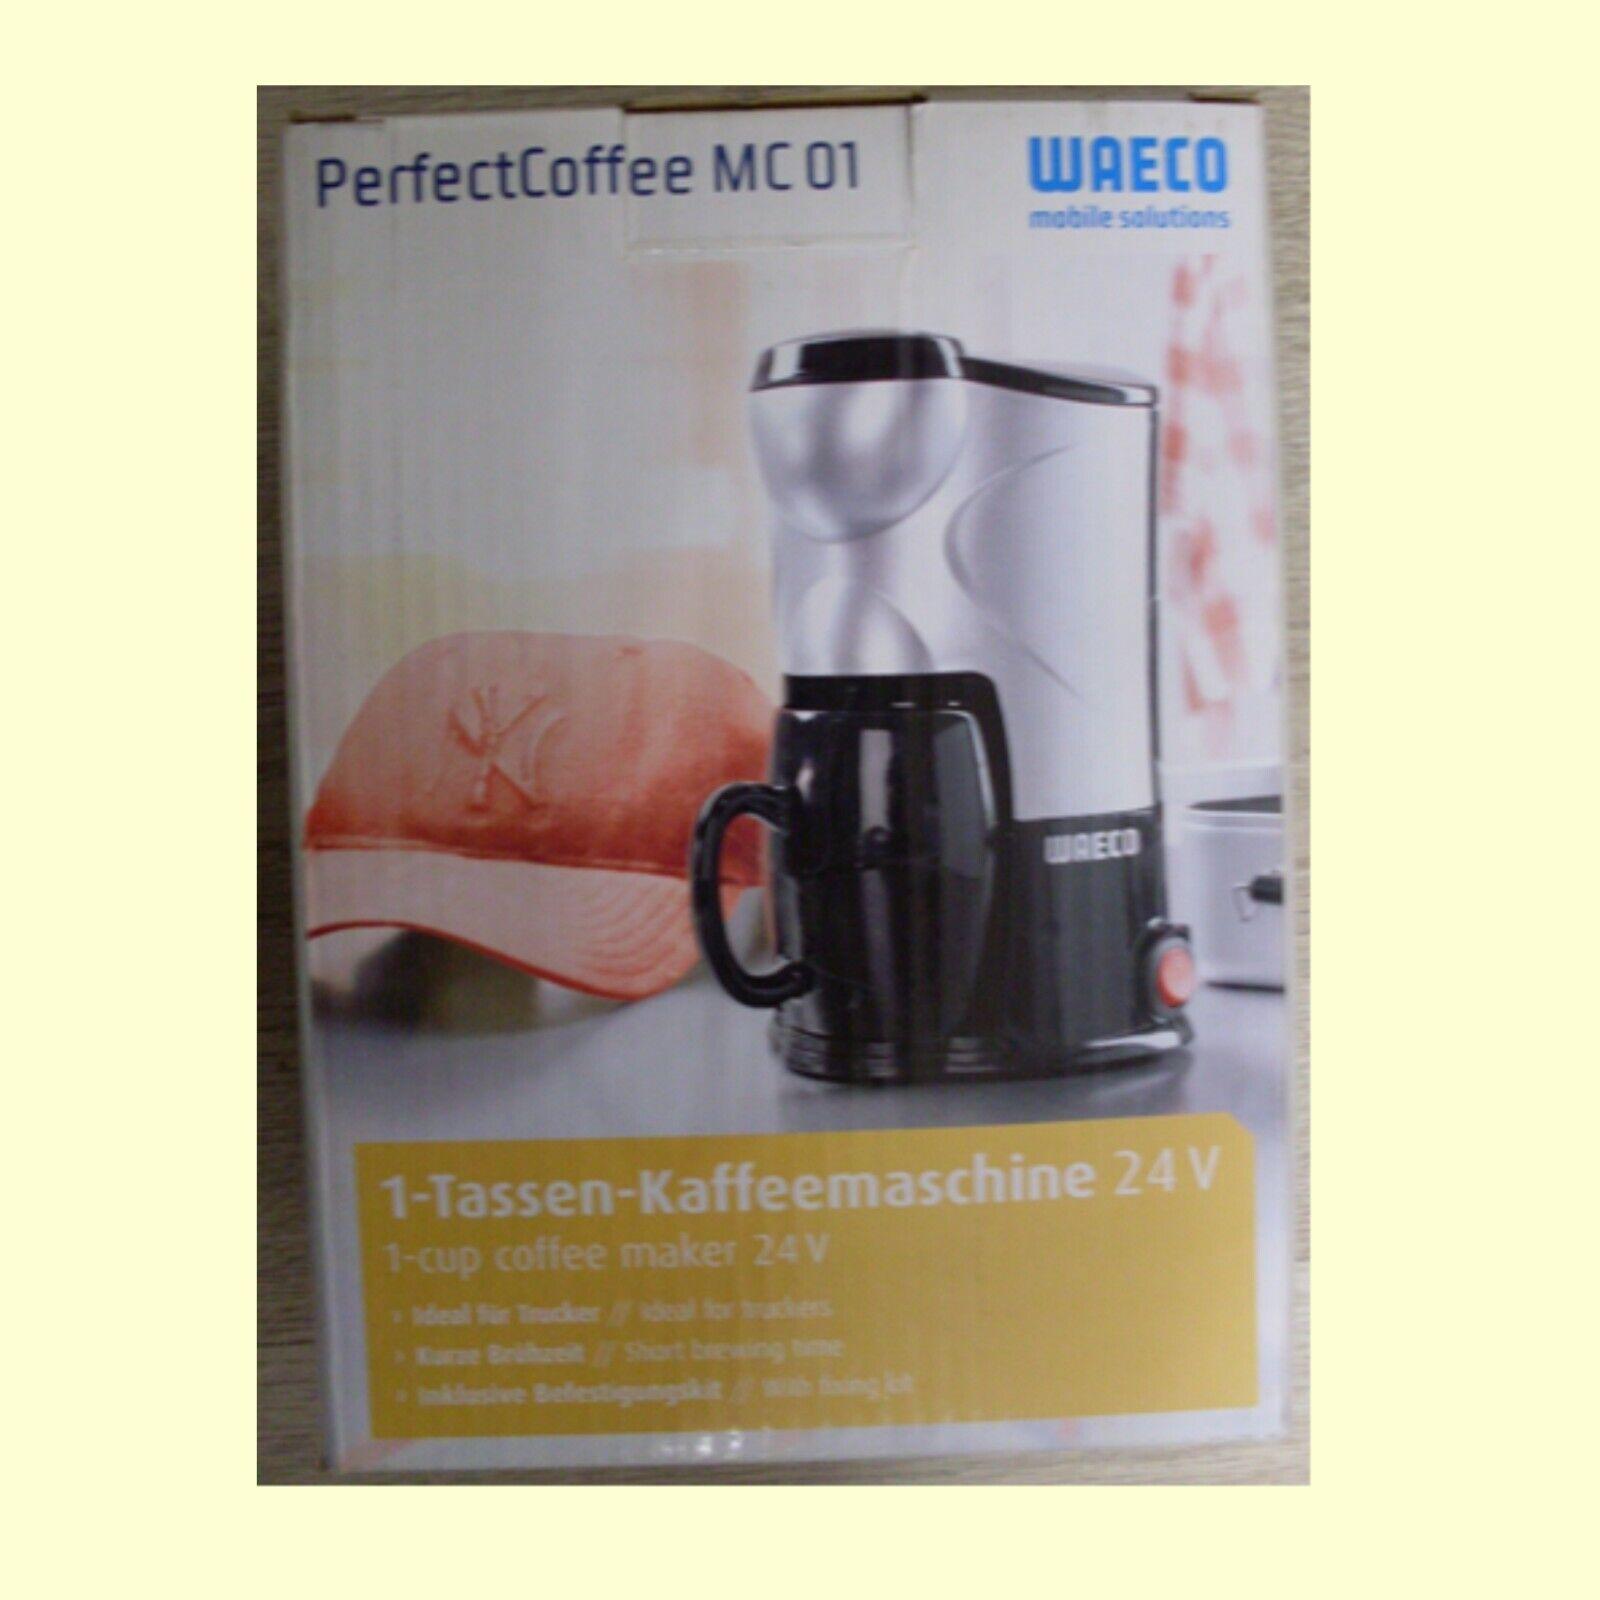 24V 24 Volt WAECO 1 Tassen Kaffeemaschine MC-01-24 PerfectCoffee LKW